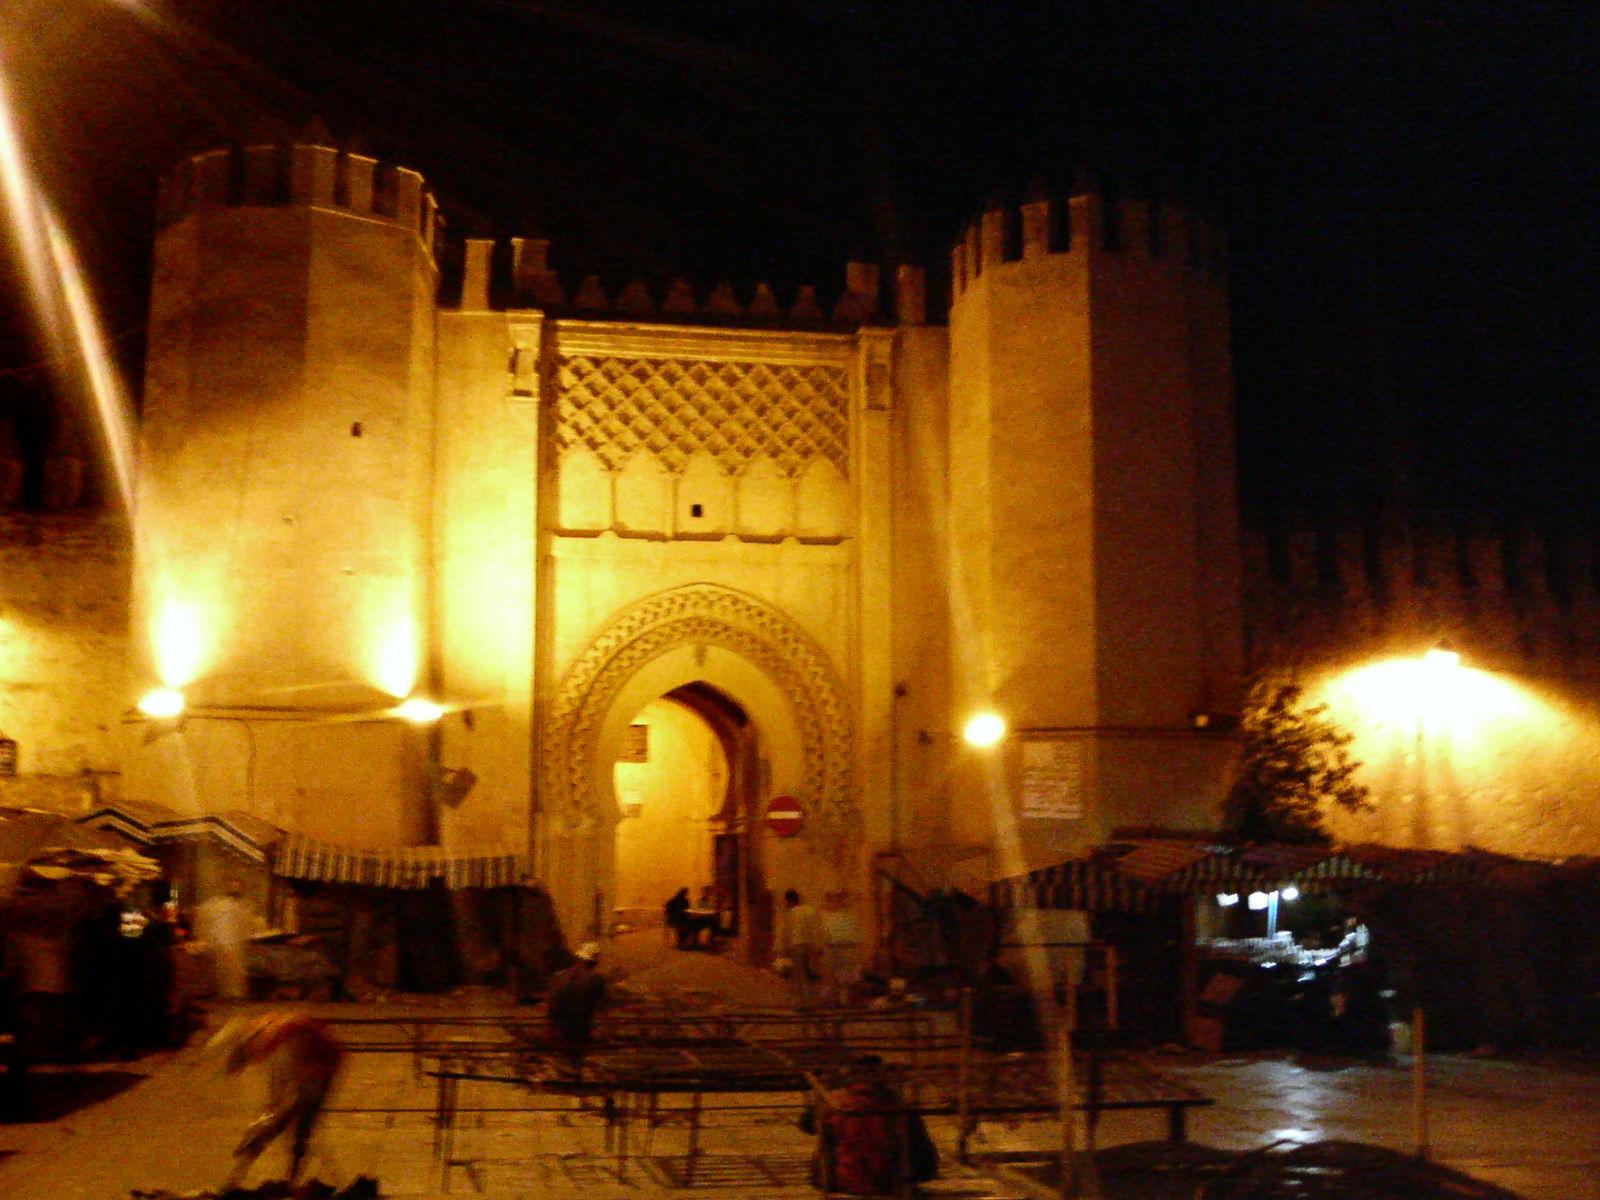 ALEXぷらぷら日記 : モロッコ旅...